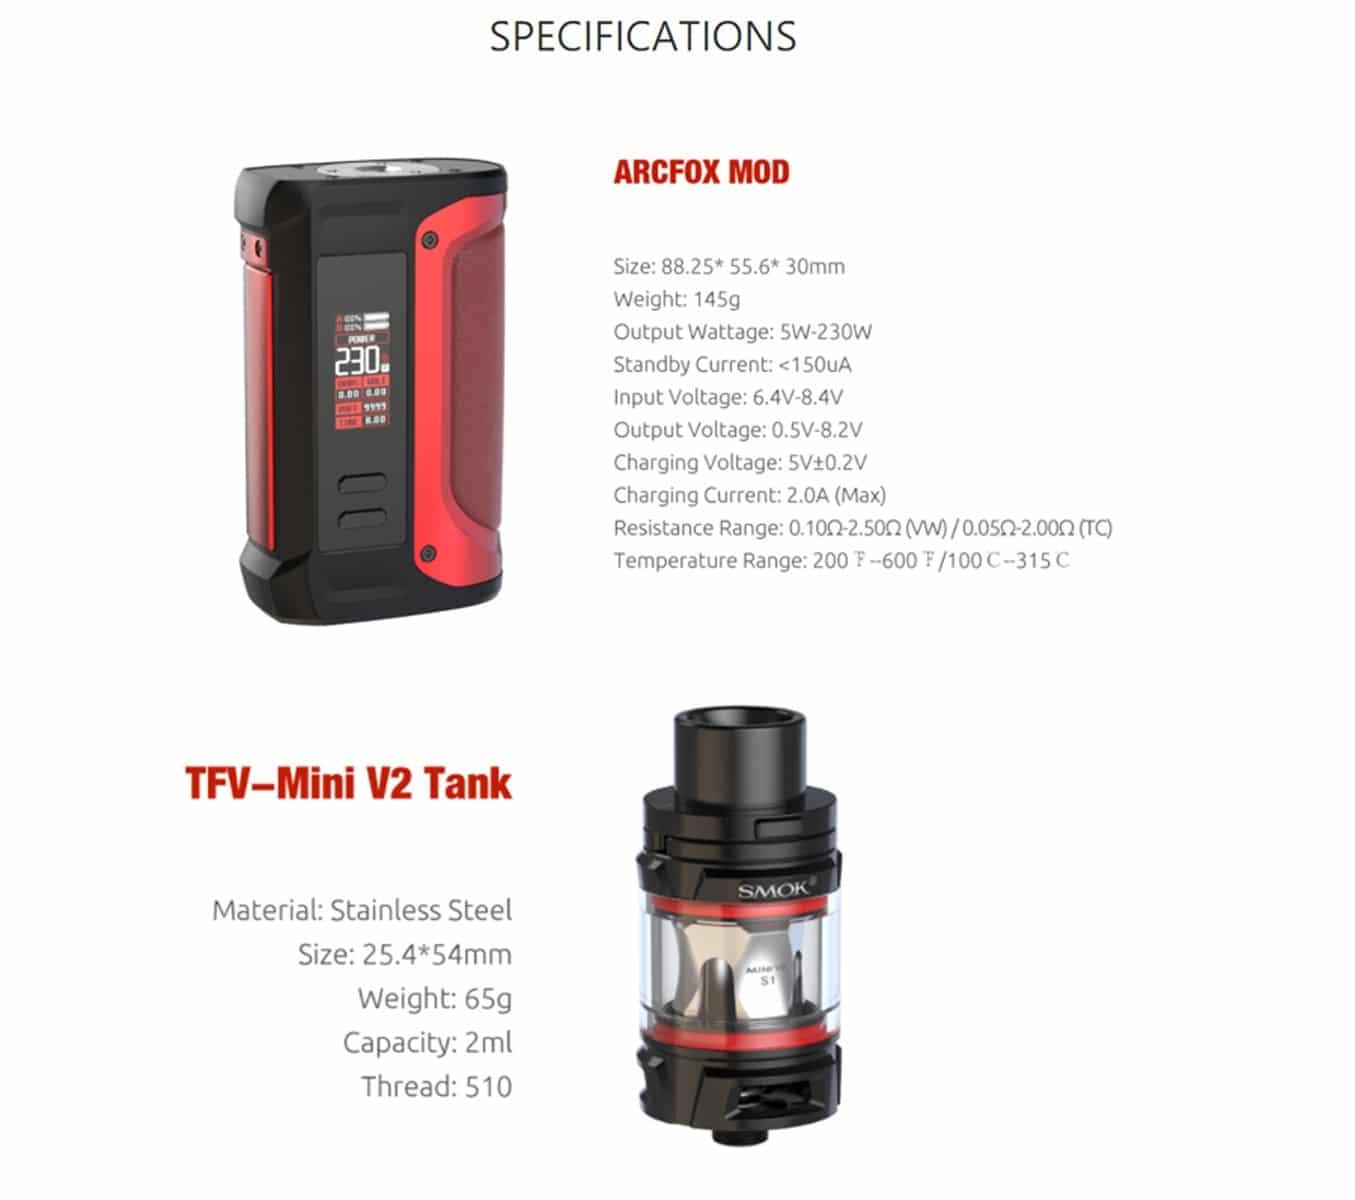 SMOK - KIT DE INICIO ARCFOX 230W CON TANQUE MINI V2